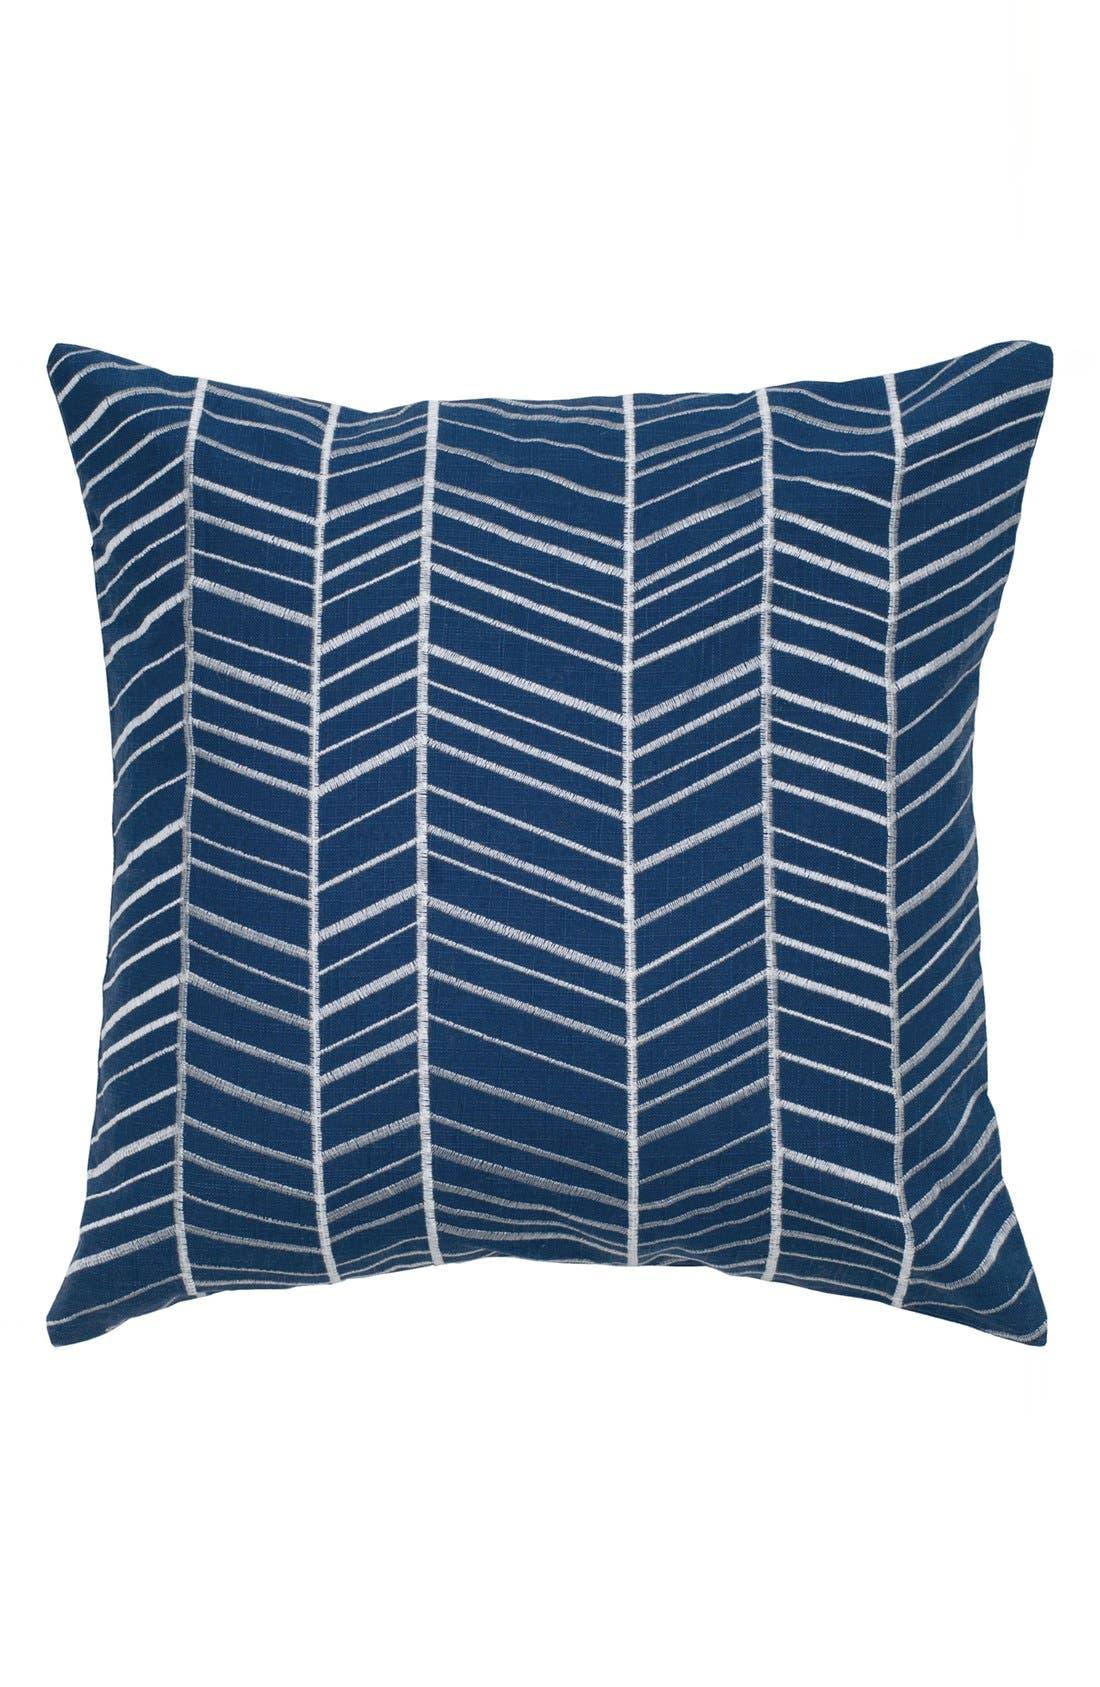 Main Image - Rizzy Home Chevron Pillow